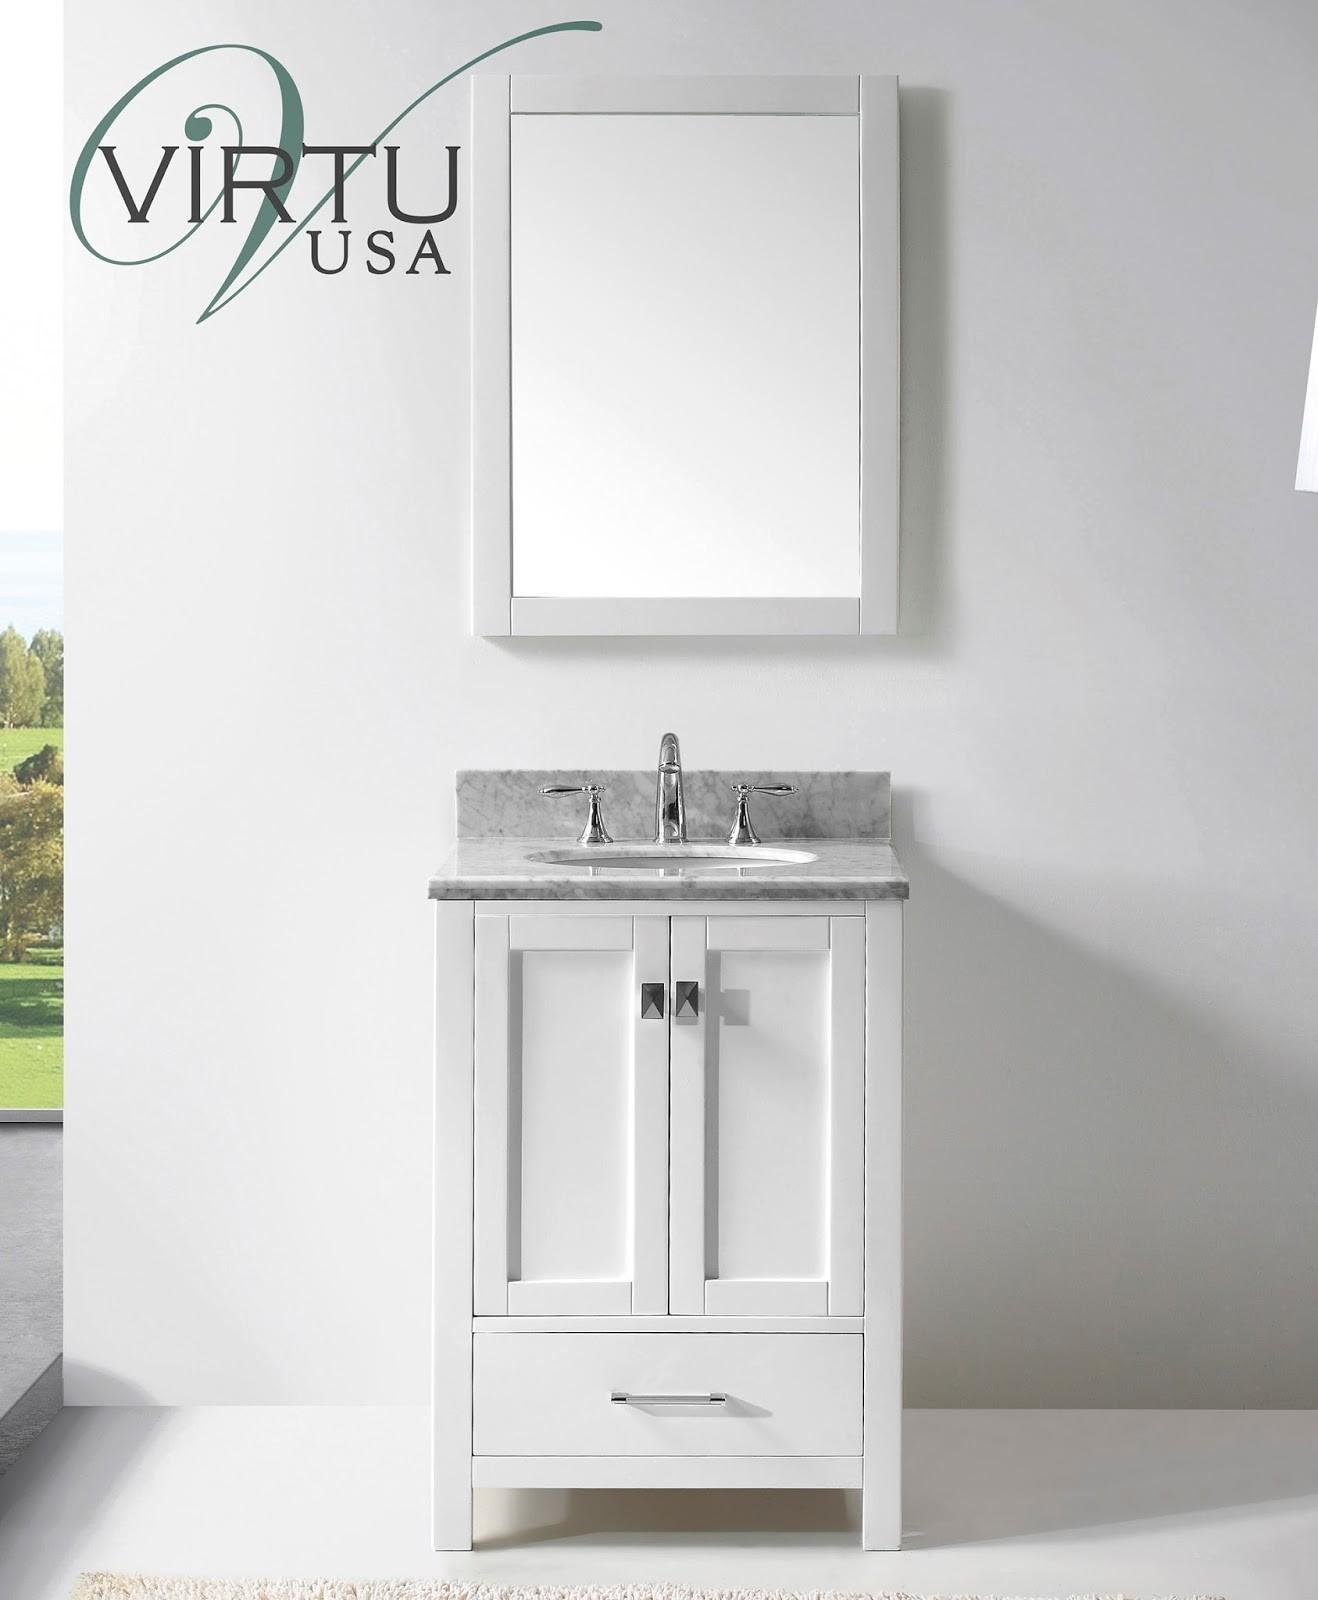 Small Bathroom Vanity New Vanity Powder Room Vanities for Small Spaces Tiny Bathroom Model